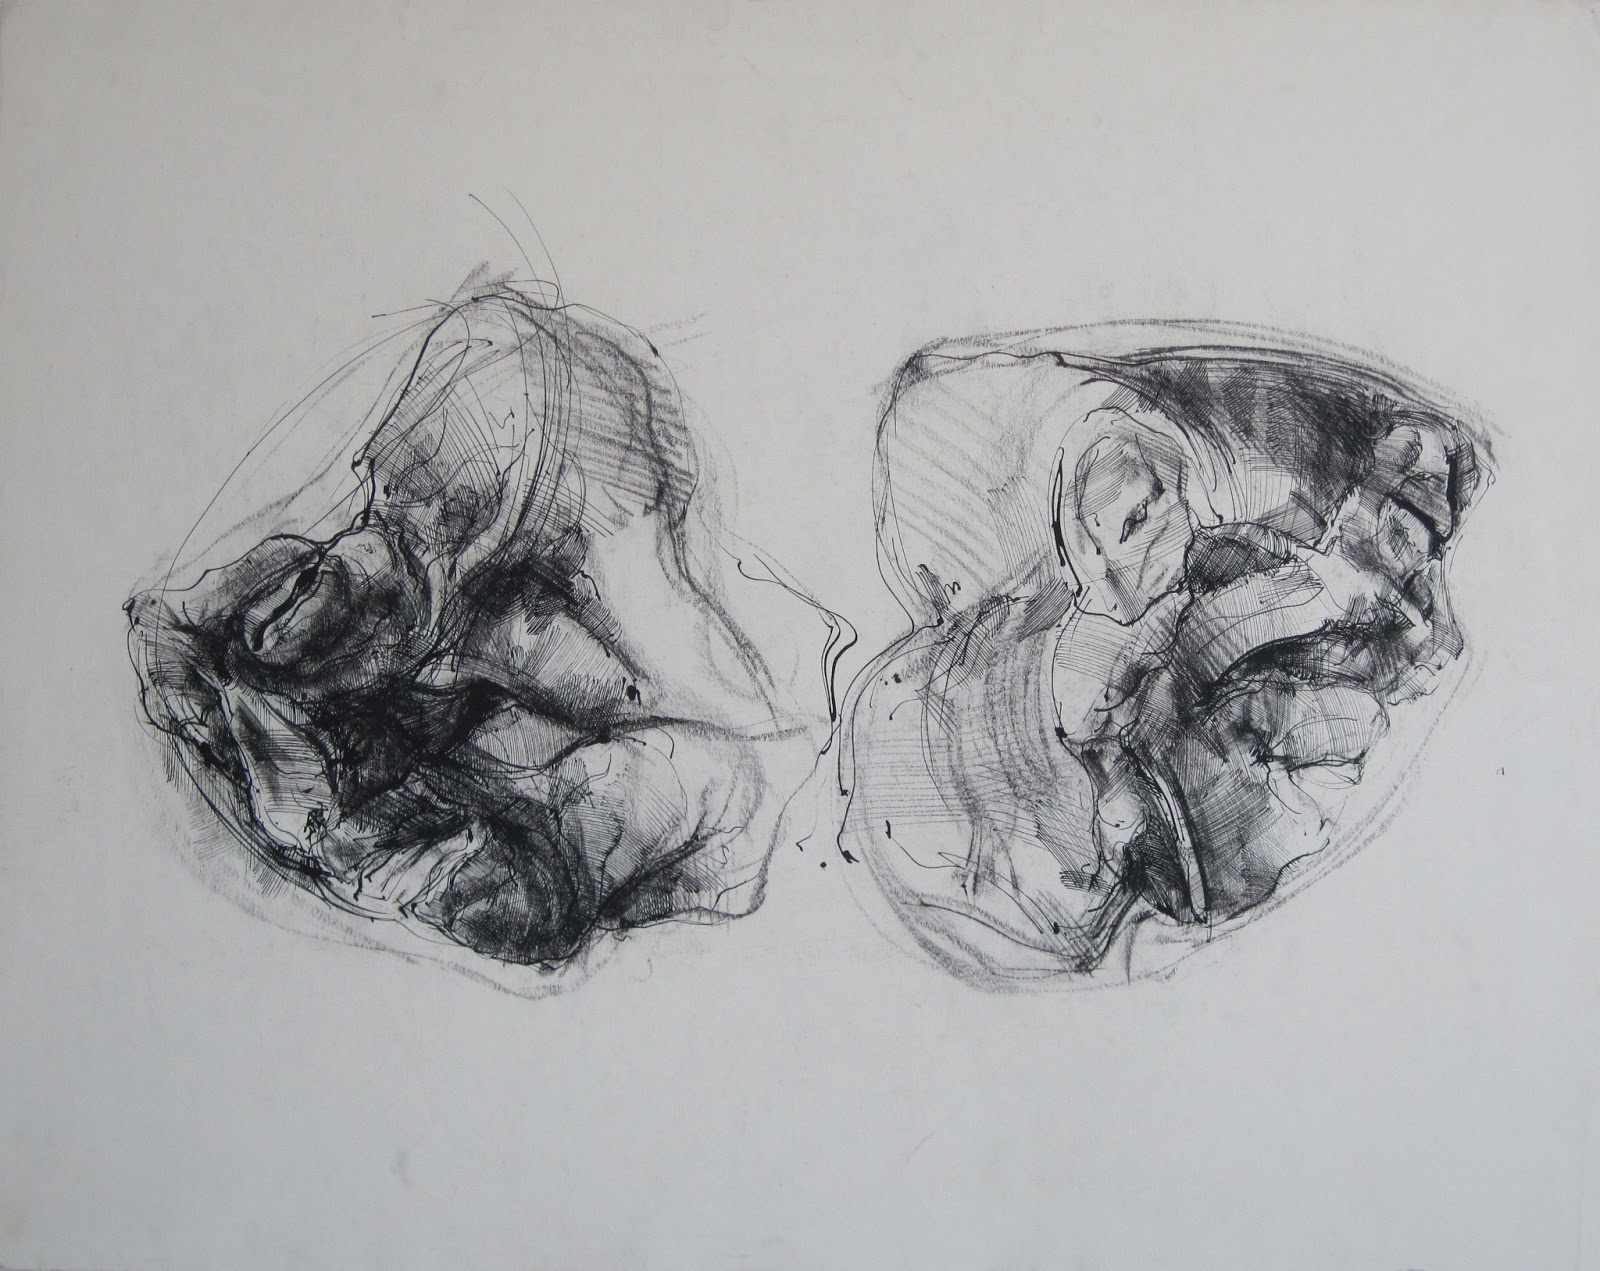 Gross anatomy painting 2390669 - follow4more.info